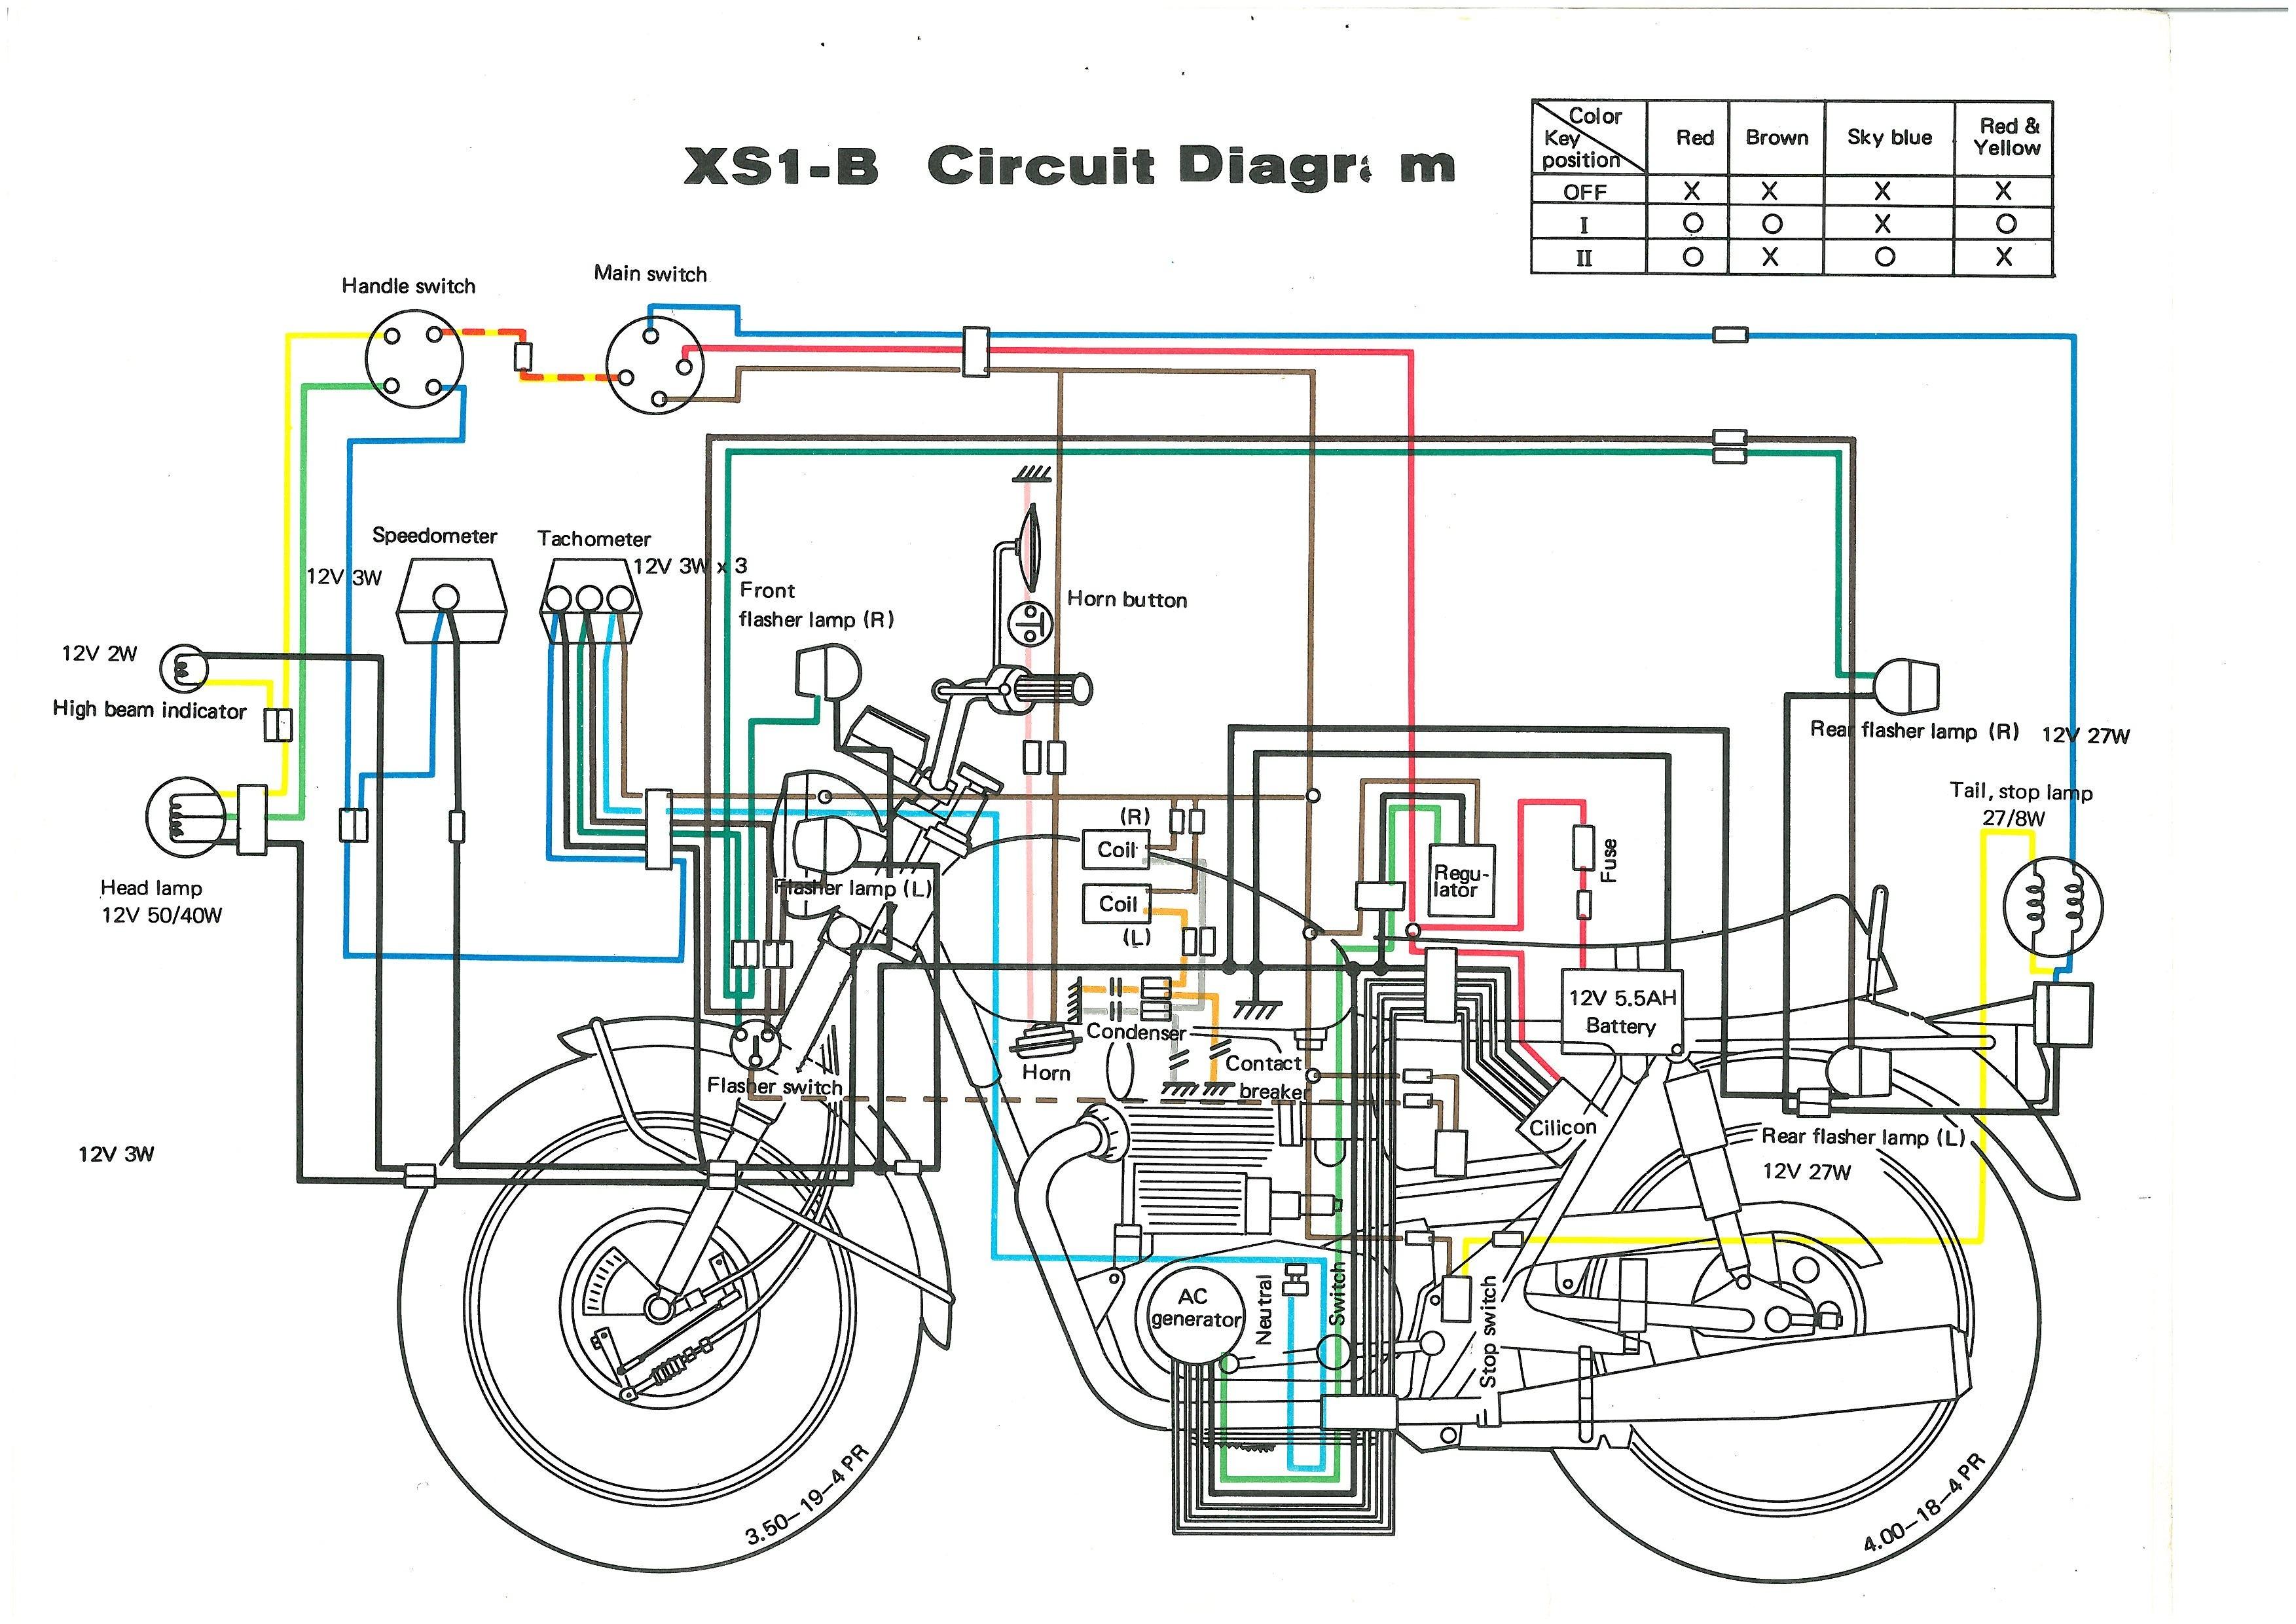 DIAGRAM] Yamaha Xt 200 Wiring Diagram FULL Version HD Quality Wiring Diagram  - CARRYBOYPHIL.K-DANSE.FRK-danse.fr